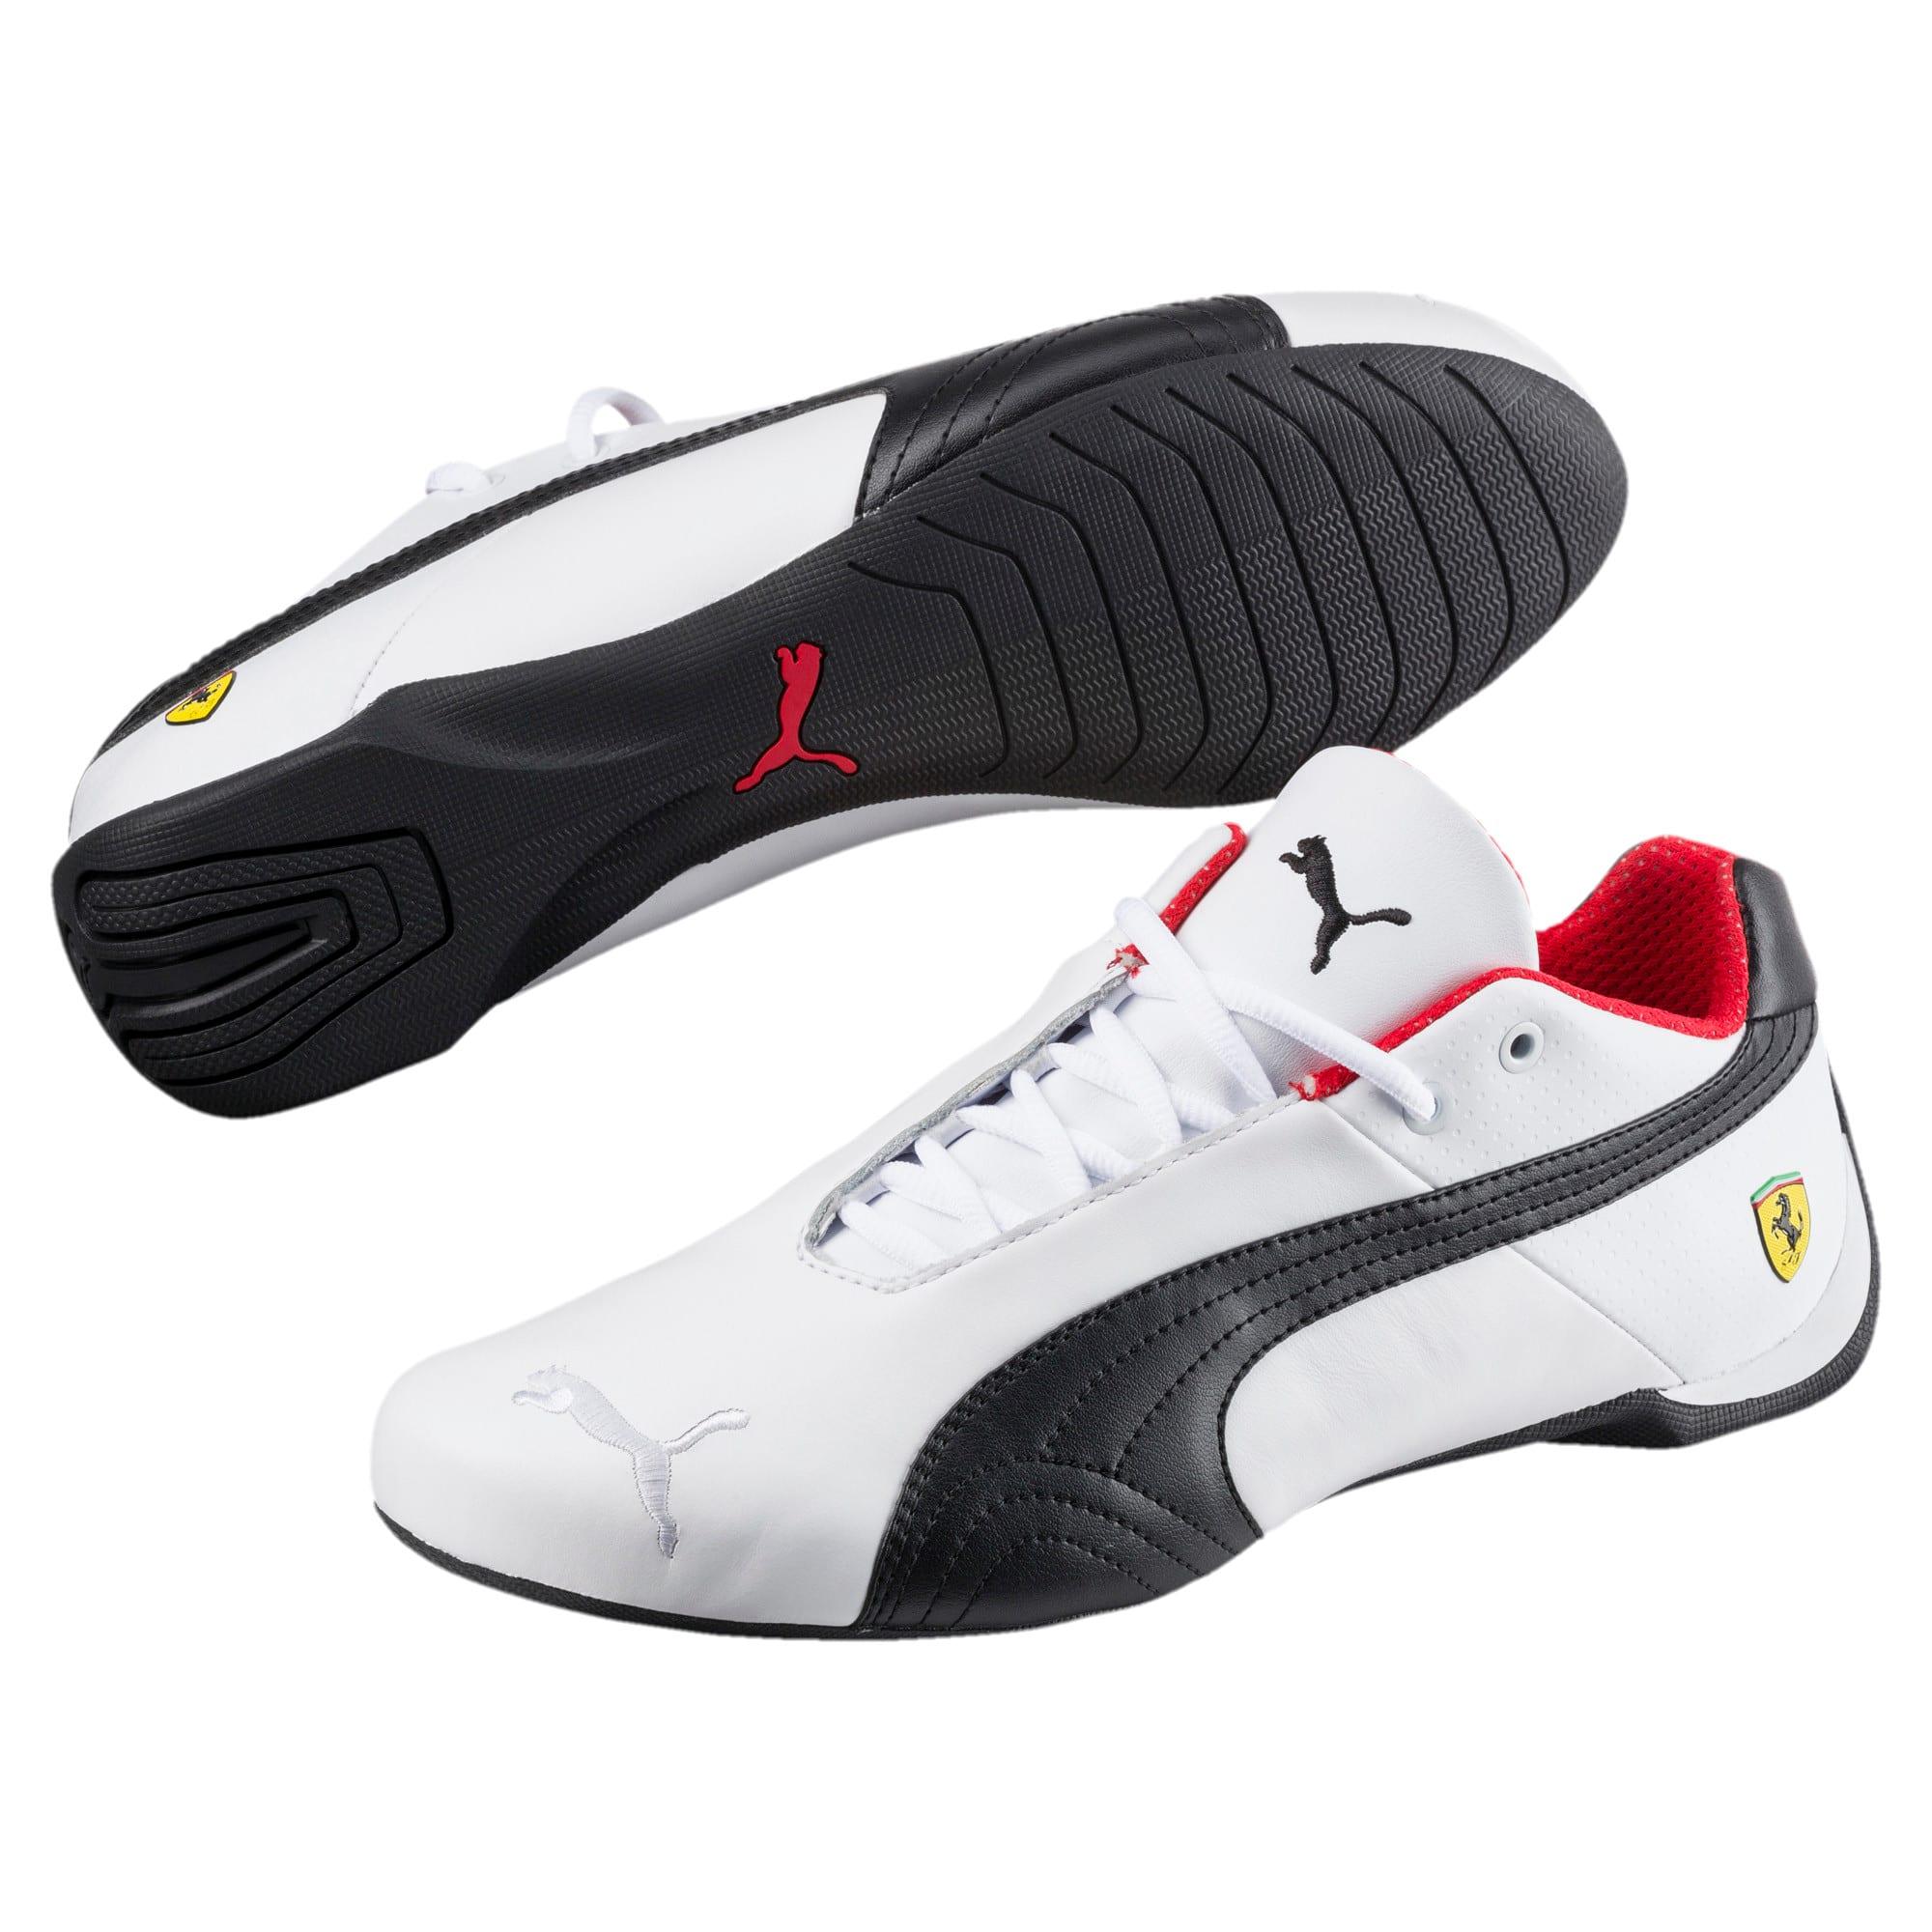 Thumbnail 2 of Ferrari Future Cat OG Trainers, White-Black-Rosso Corsa, medium